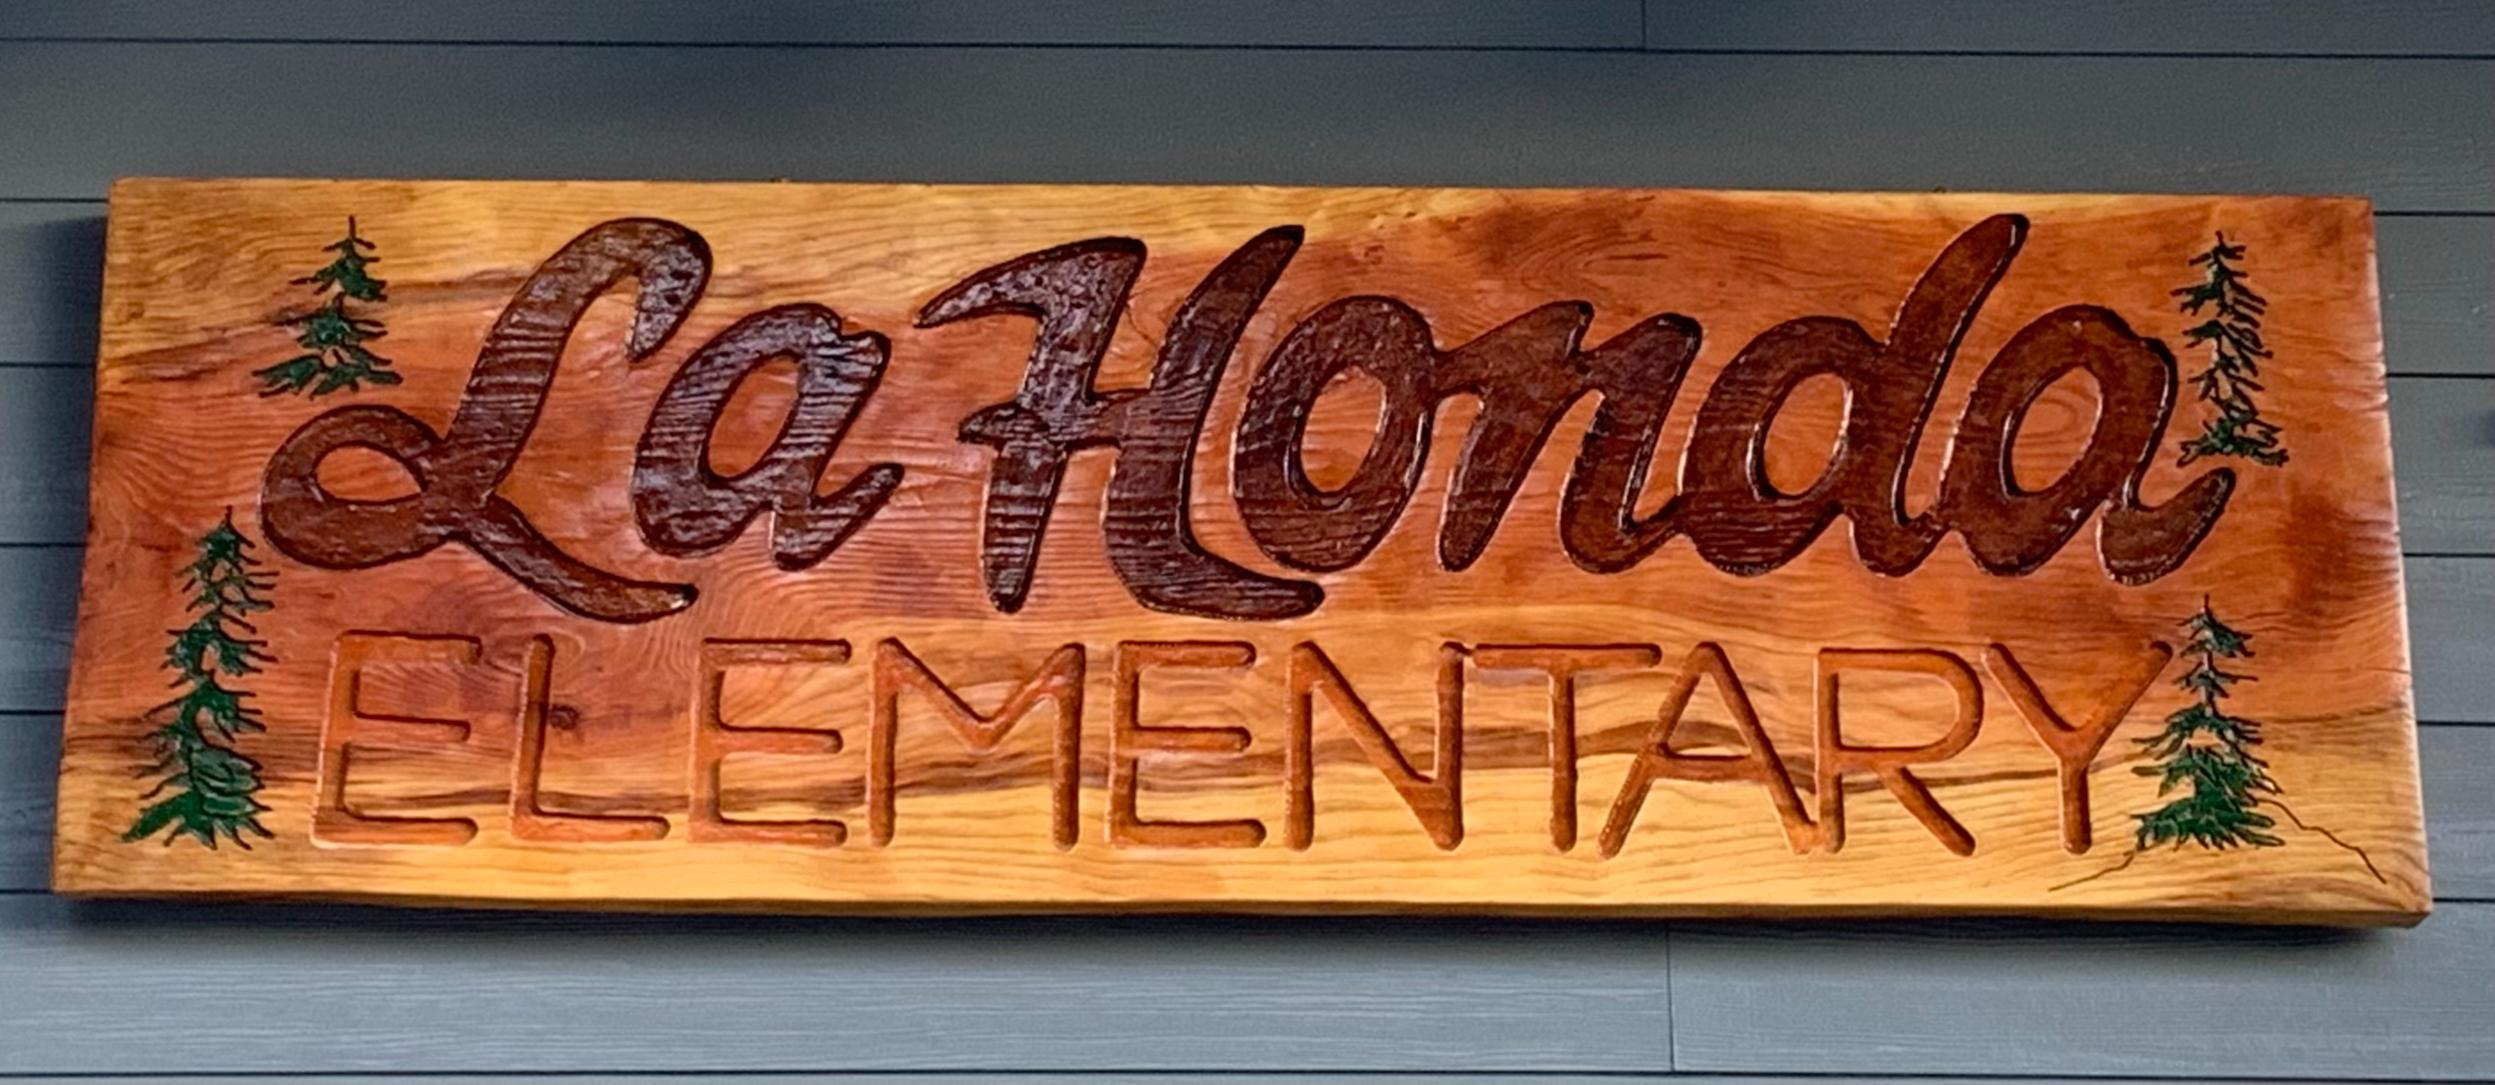 La Honda Elementary Carved Wooden Sign